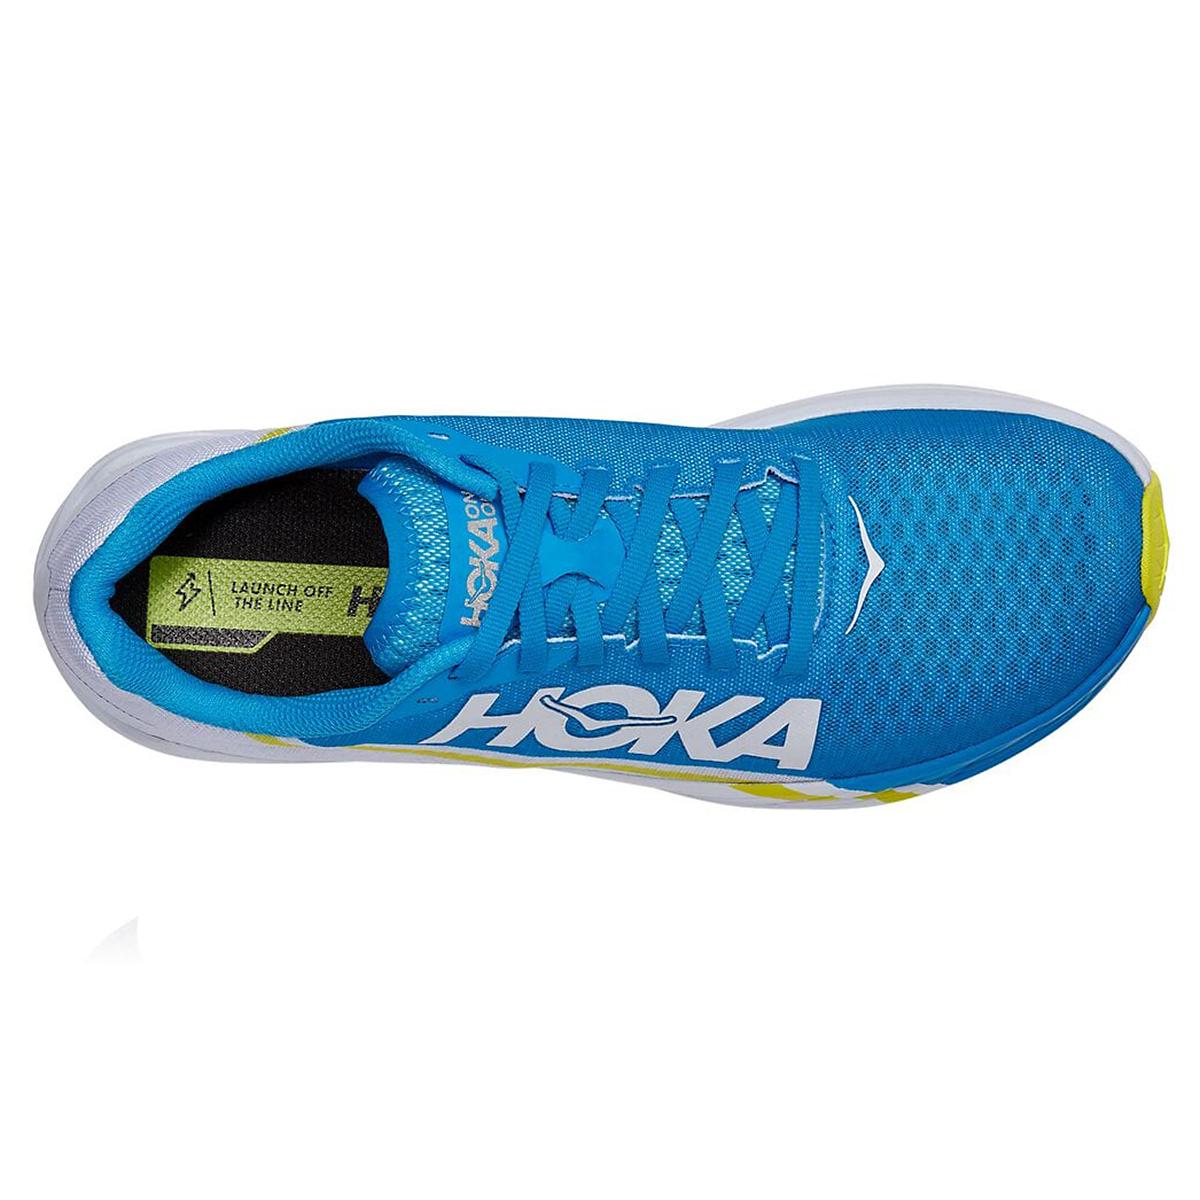 Hoka One One Rocket X Running Shoe - Color: White/Diva Blue - Size: M5/W6 - Width: Regular, White/Diva Blue, large, image 3